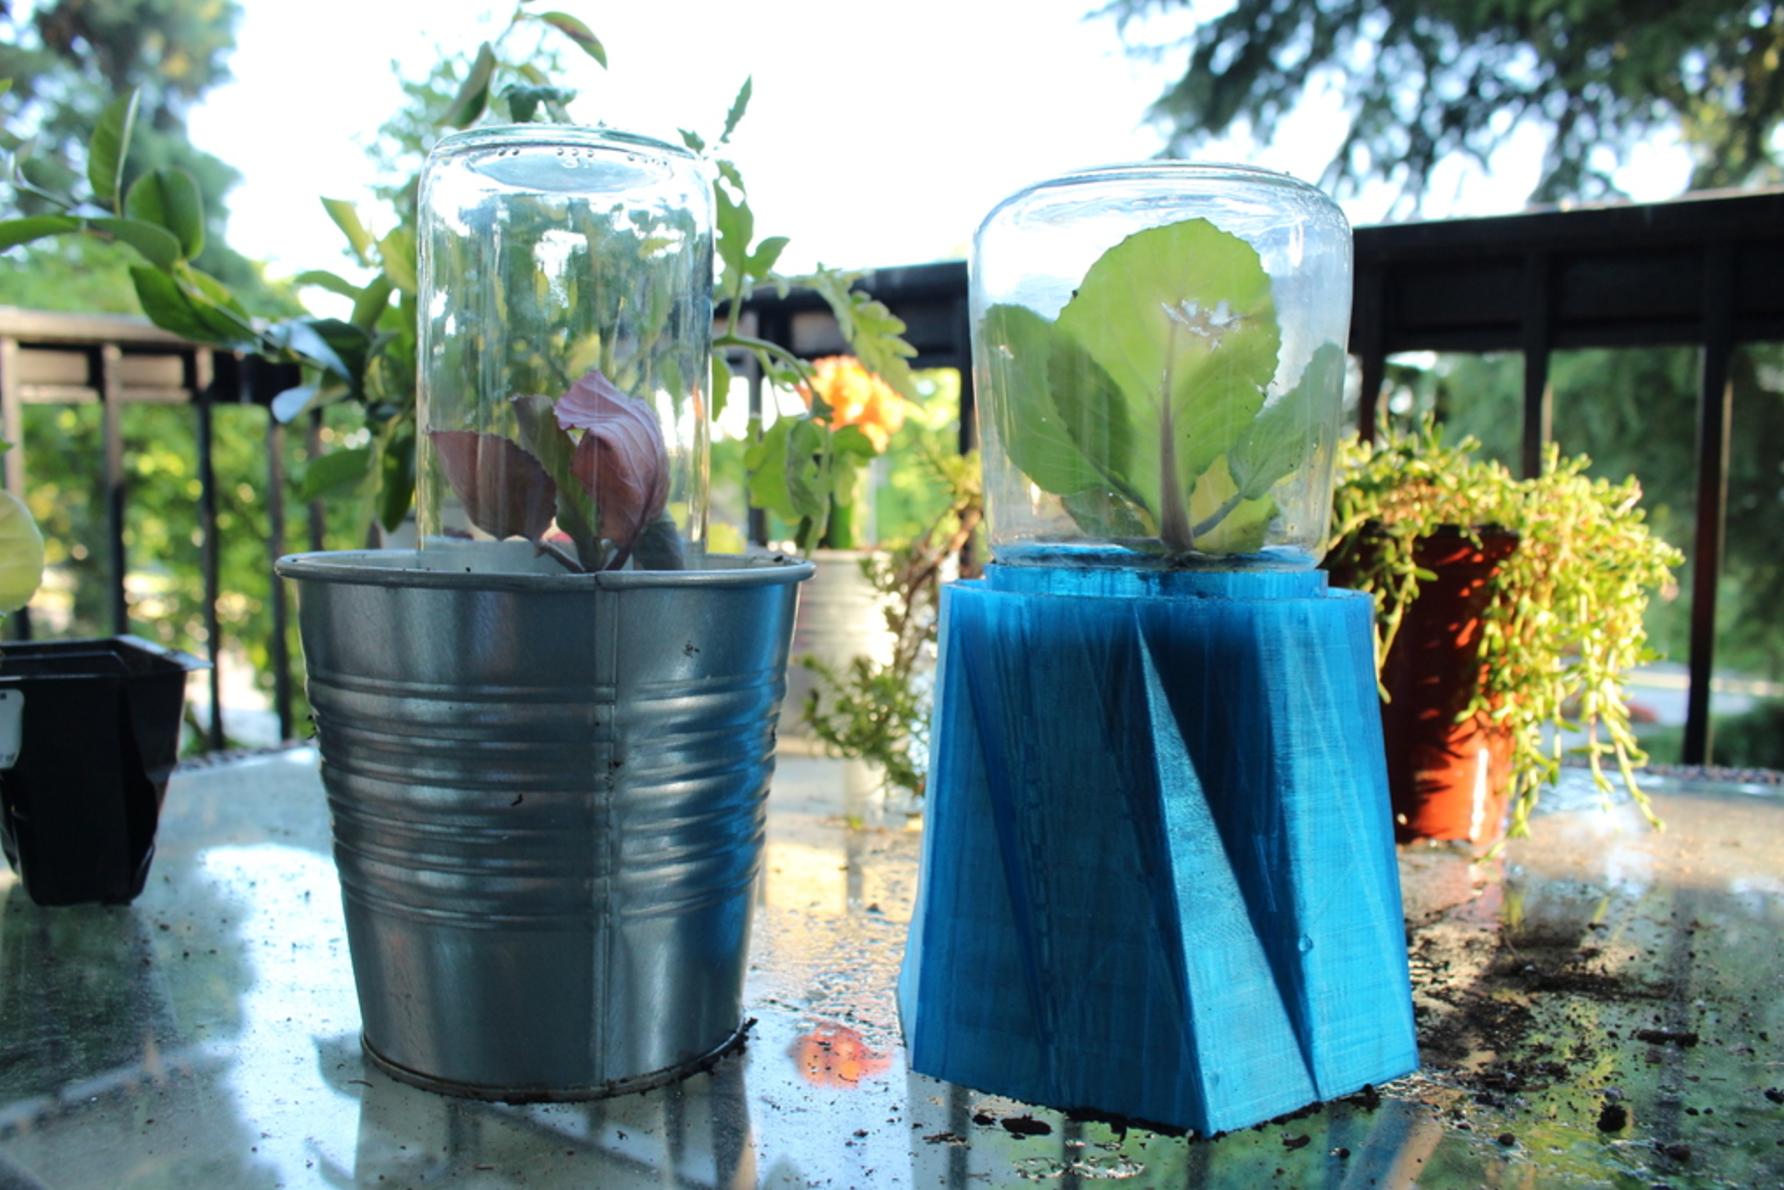 Invernadero Mini DIY1.png Download free STL file Greenhouse Mini DIY • 3D printer object, Gonzalor